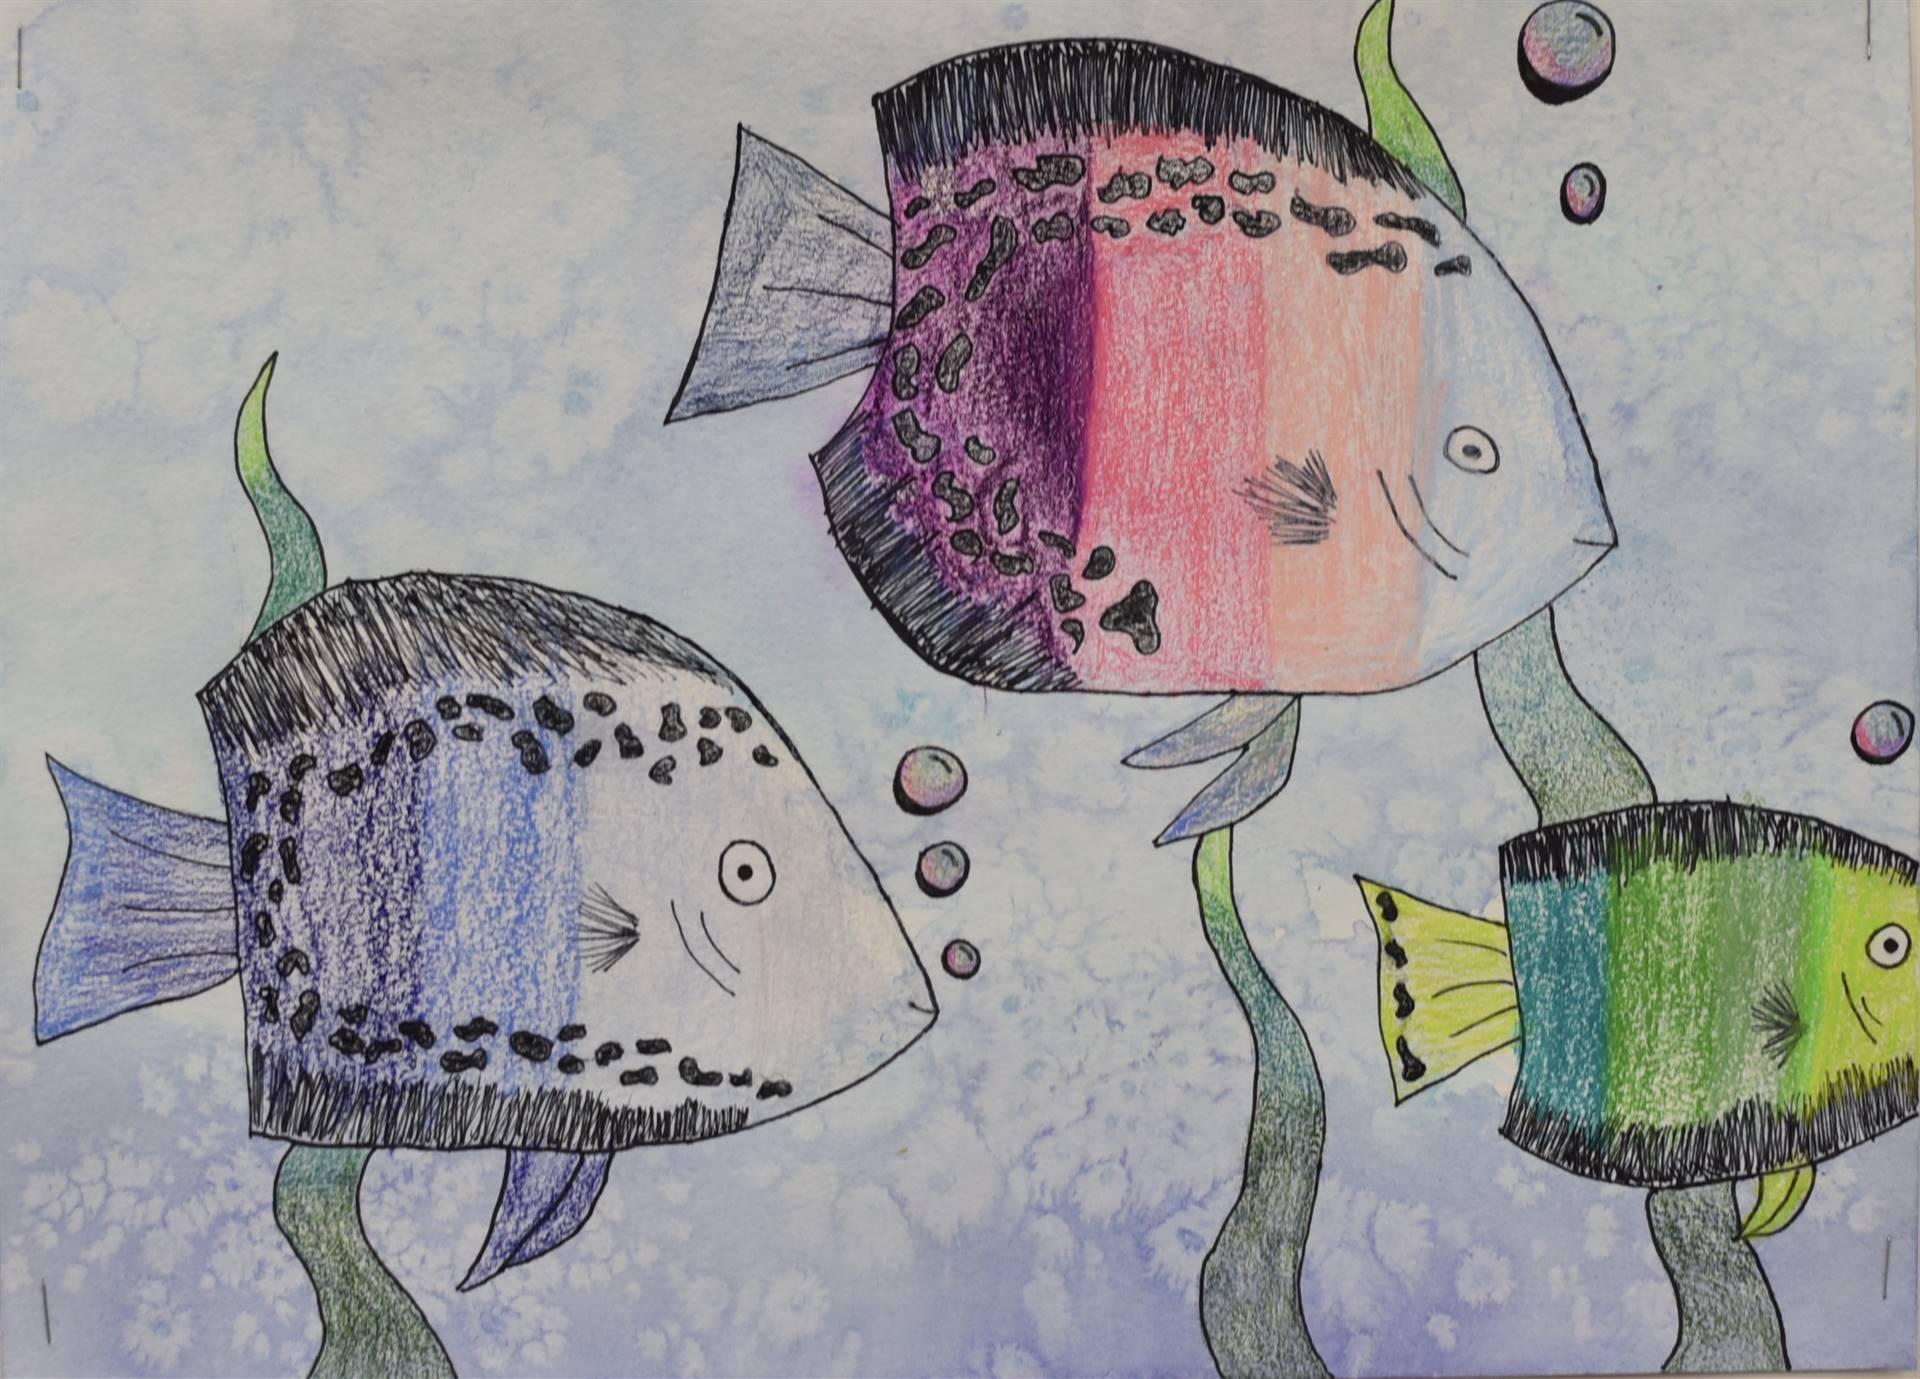 Brecksville-Broadview Hts. Middle School Art Projects 138